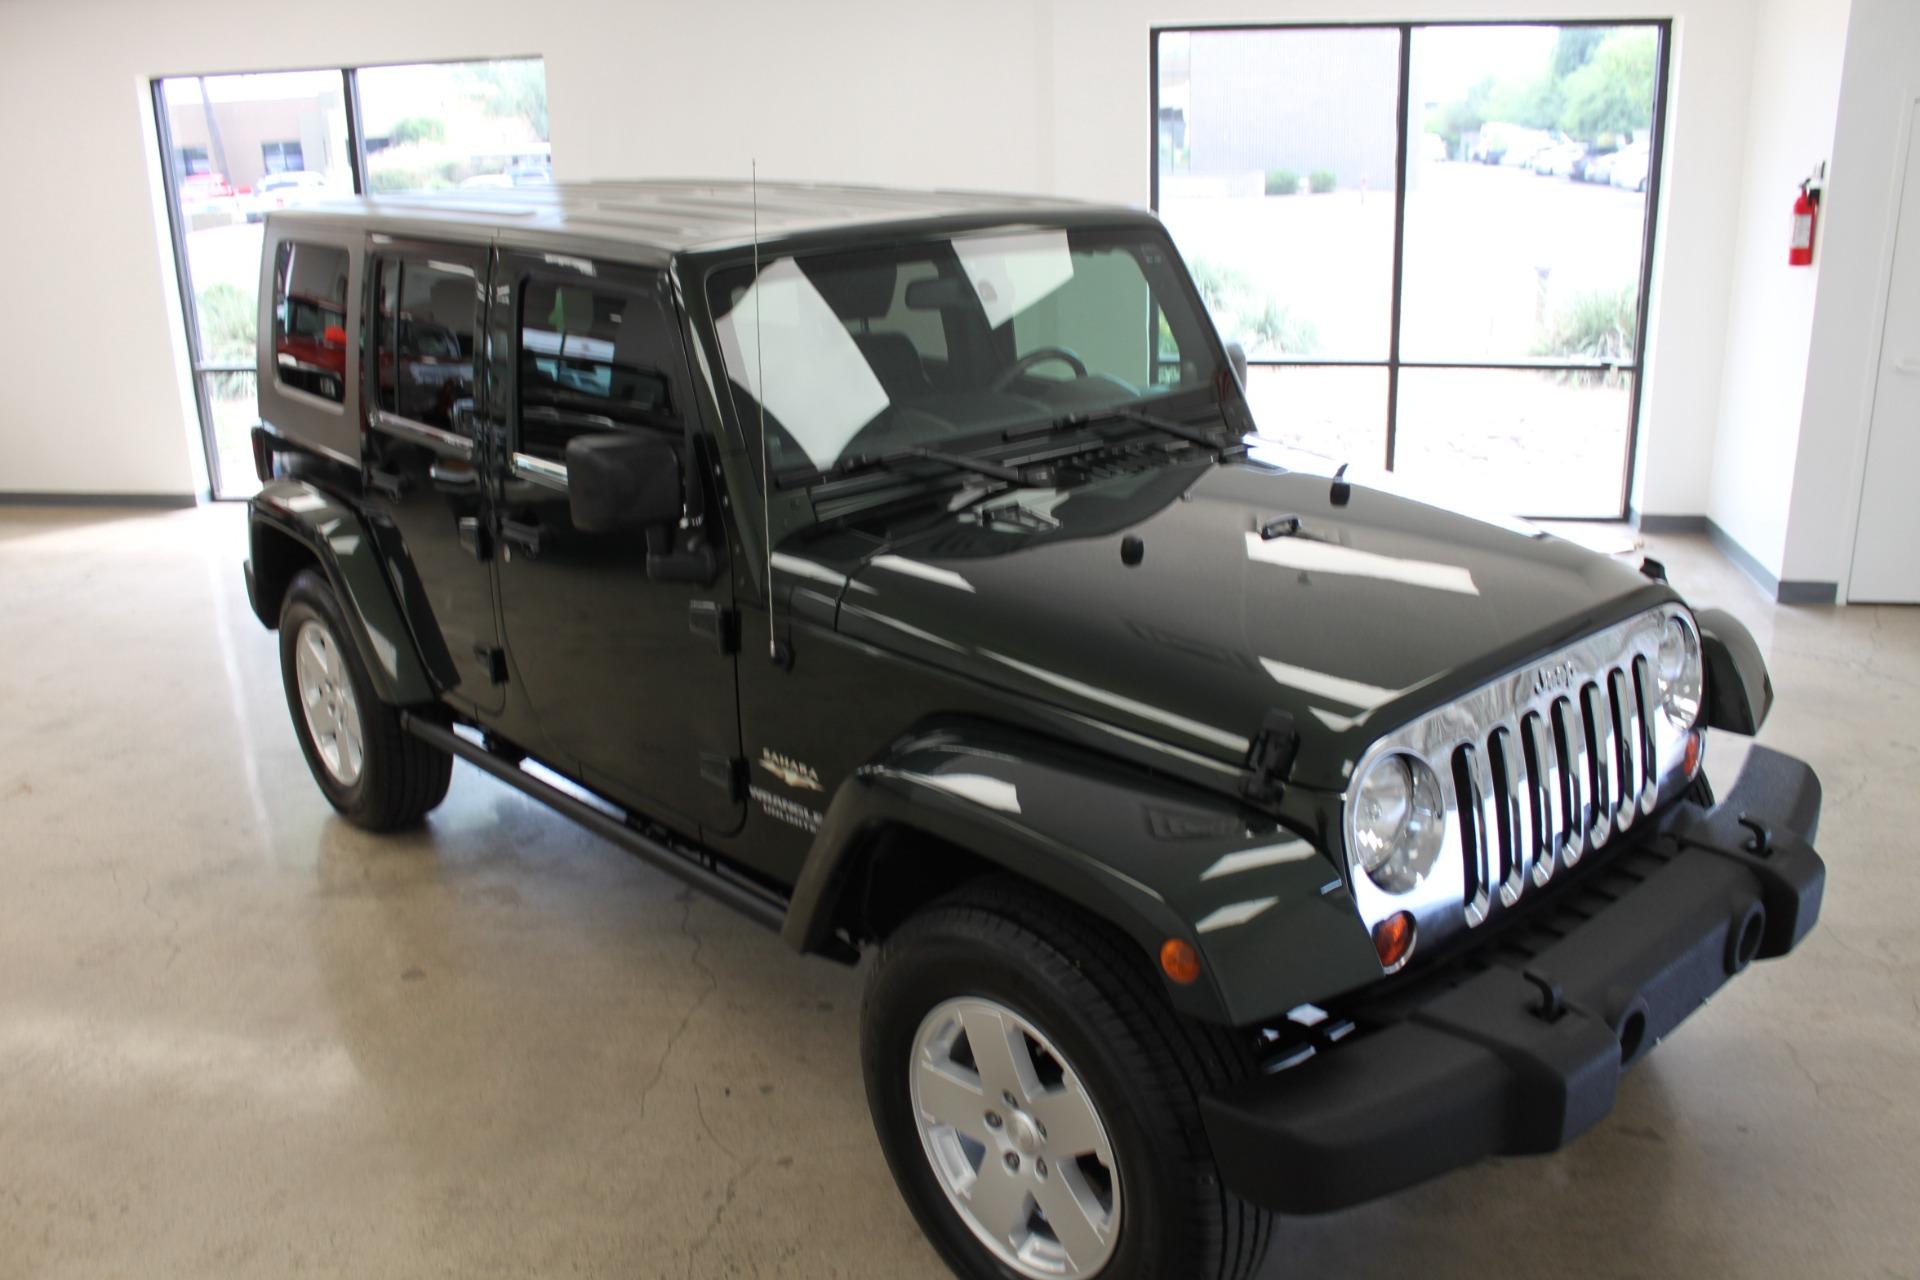 Used-2010-Jeep-Wrangler-Unlimited-Sahara-4X4-Fiat